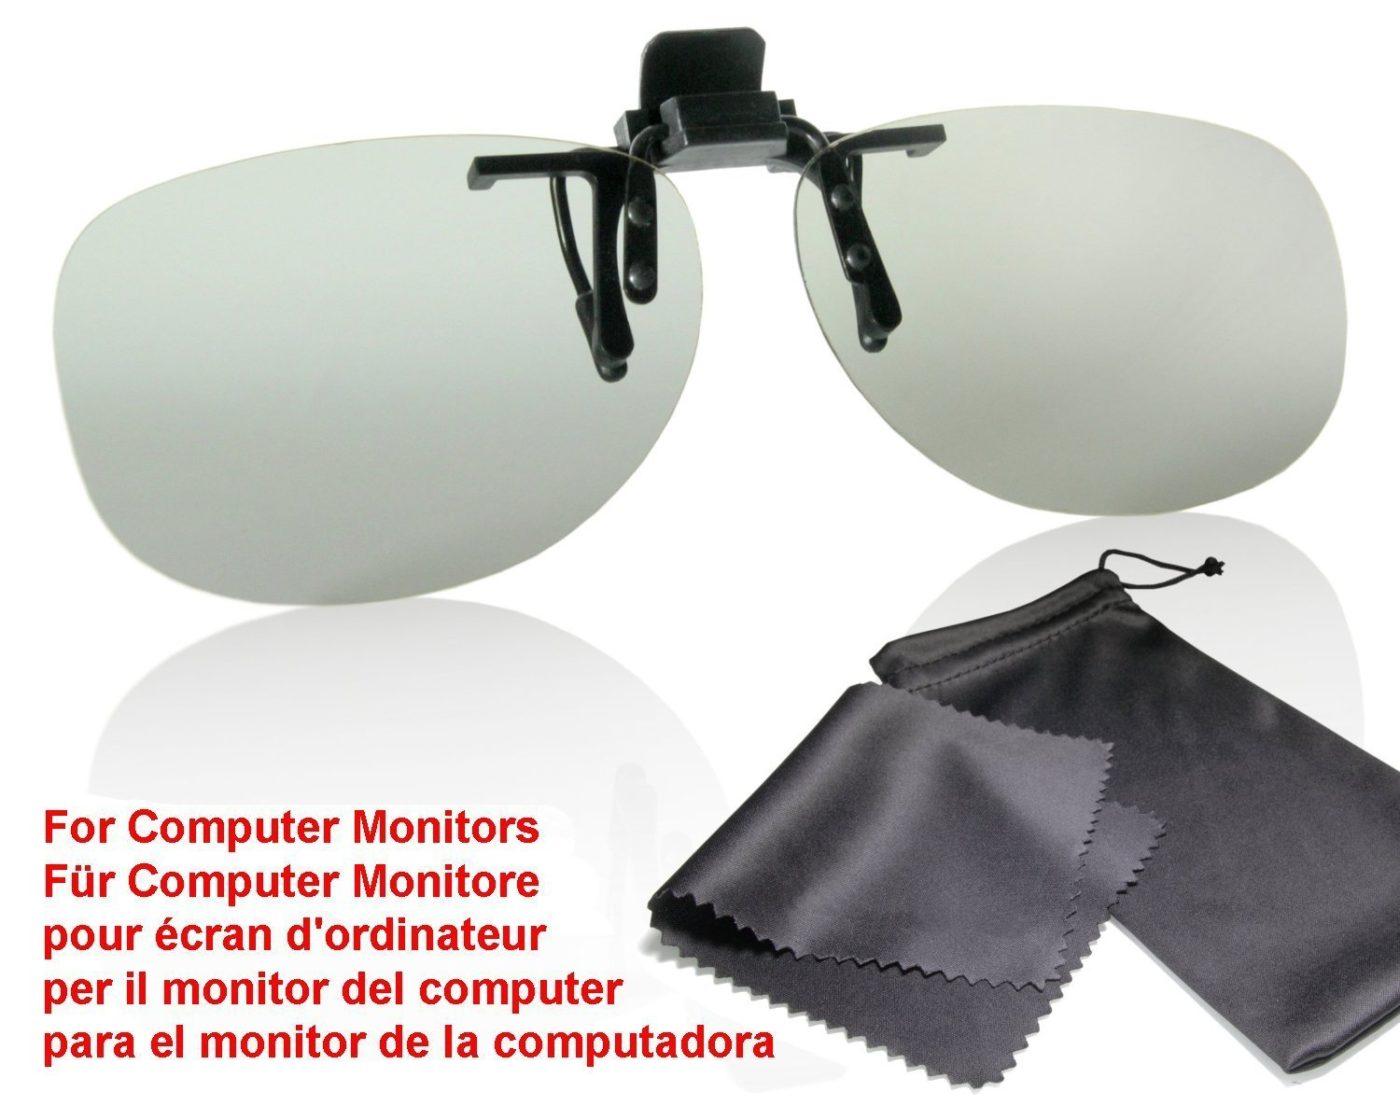 10D MONITOR BRILLEN CLIP FÜR COMPUTER-MONITORE